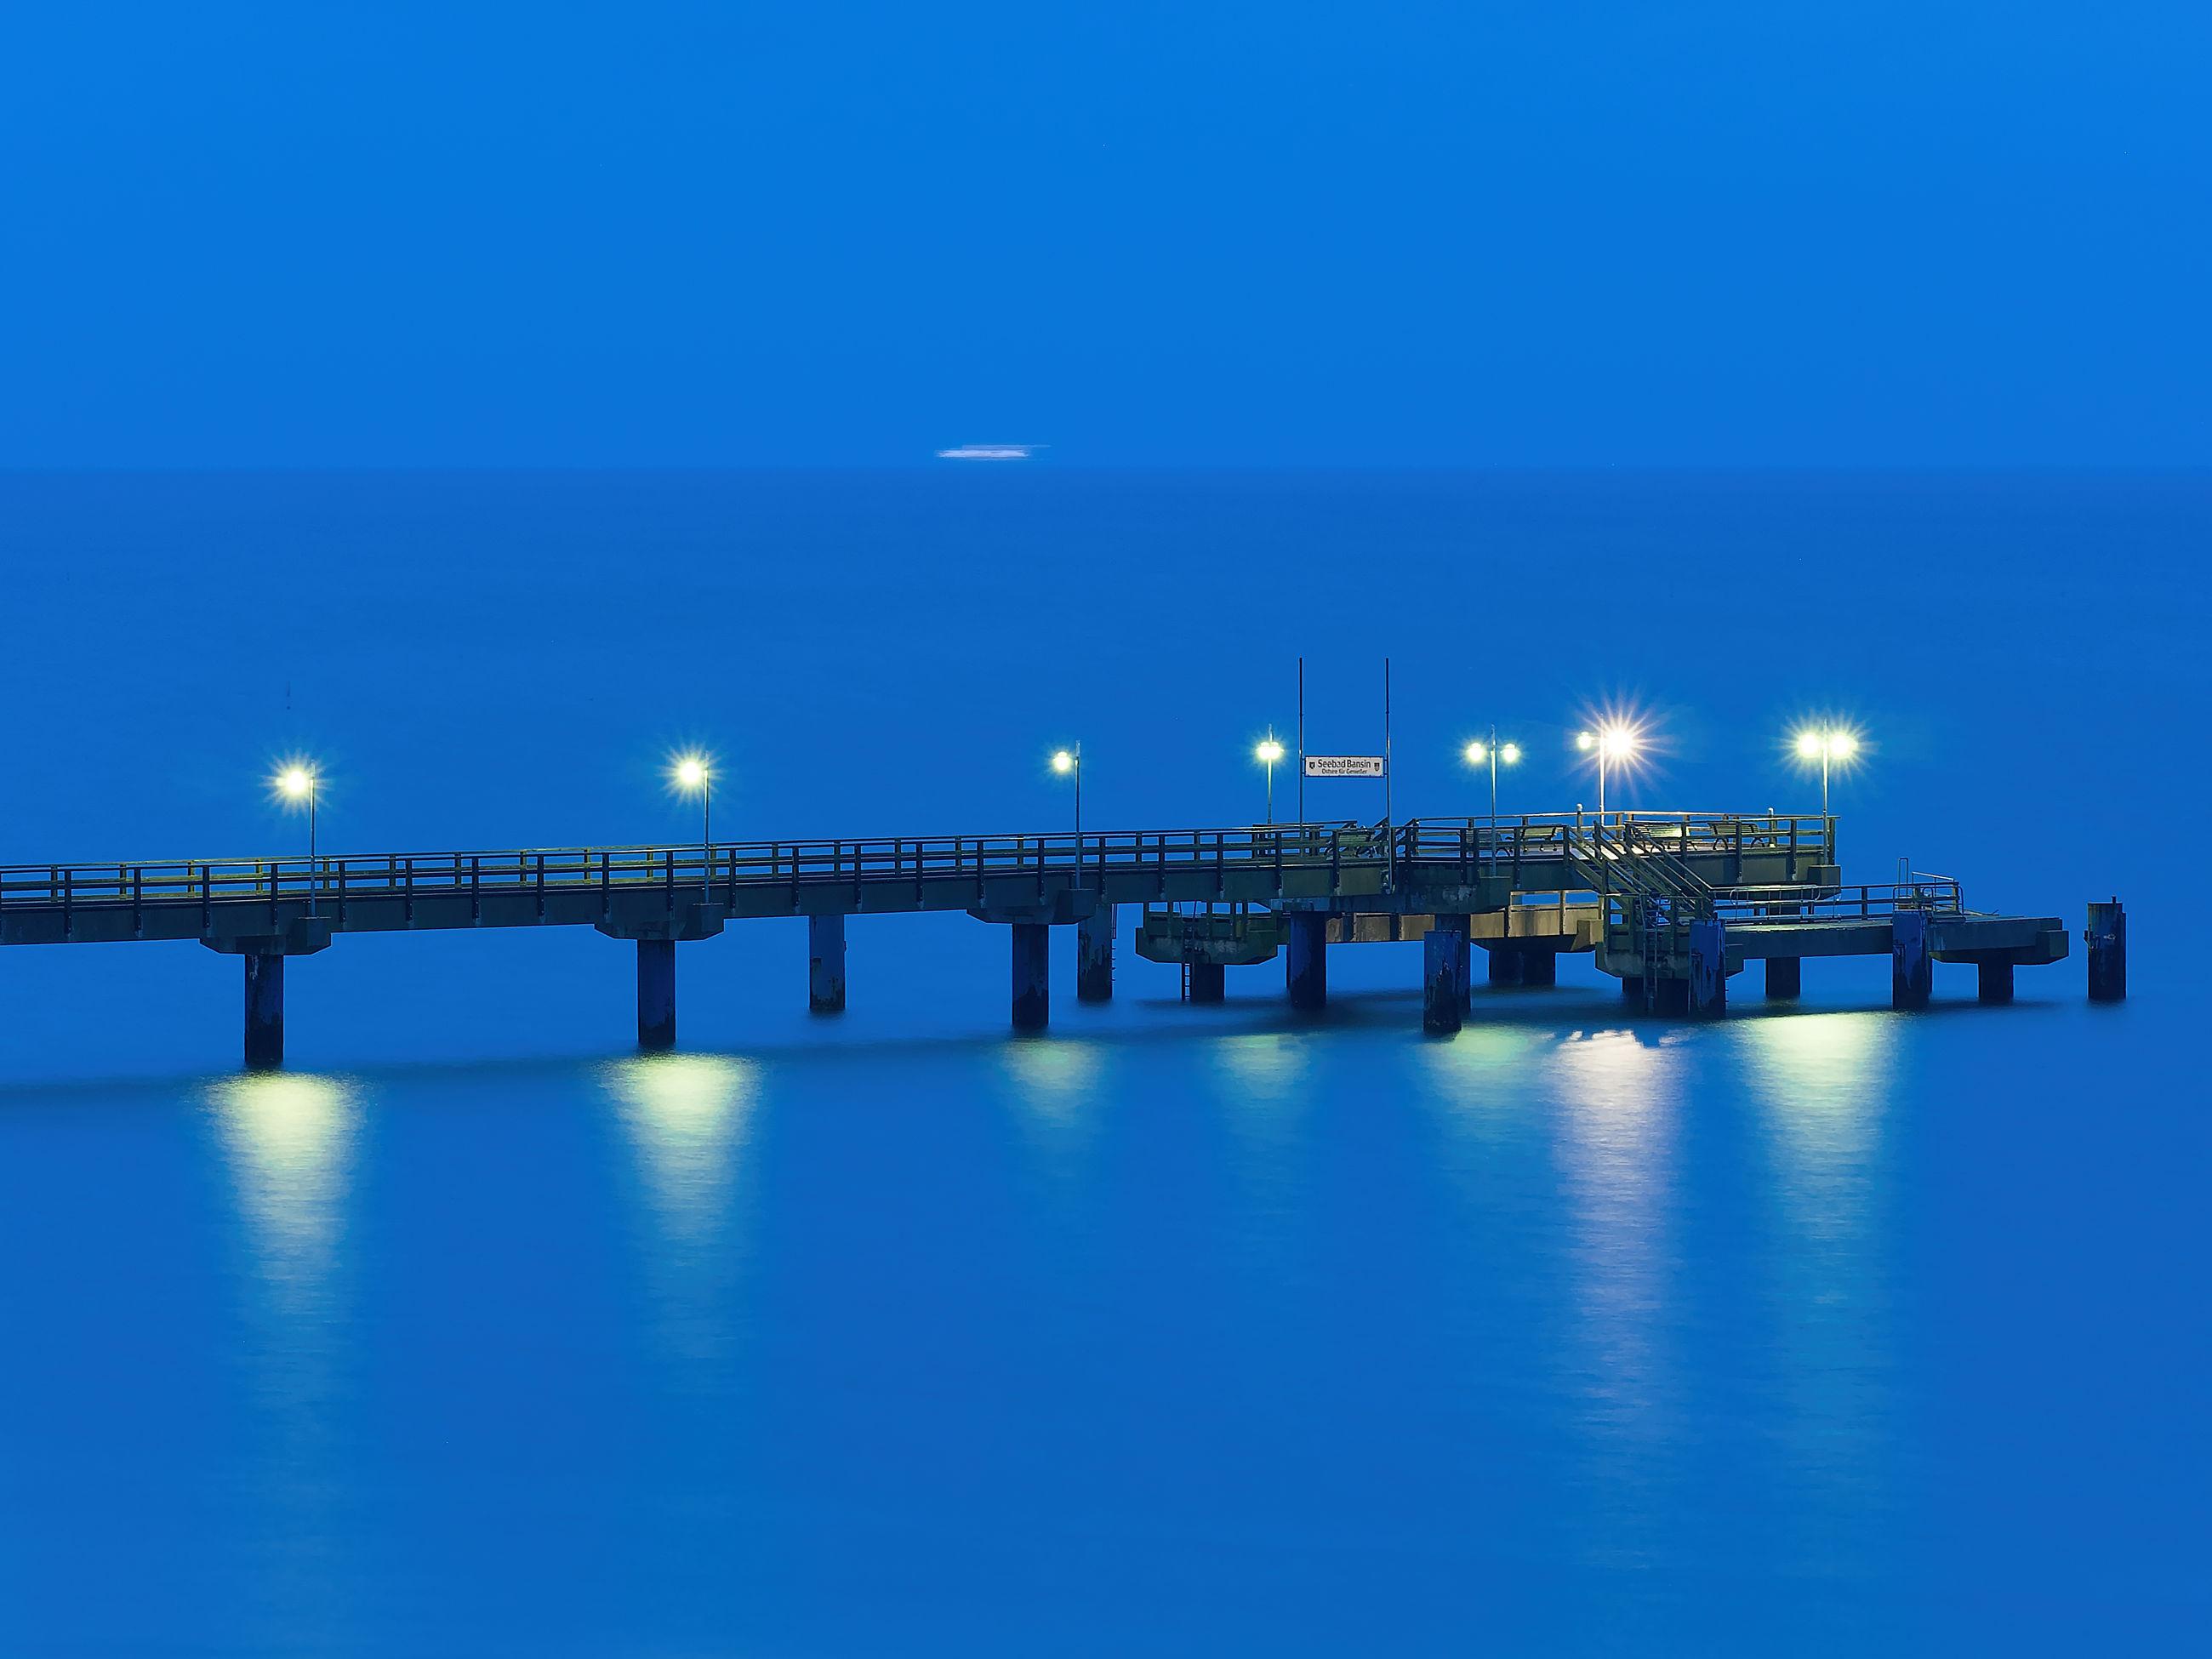 ILLUMINATED BRIDGE OVER SEA AGAINST BLUE SKY